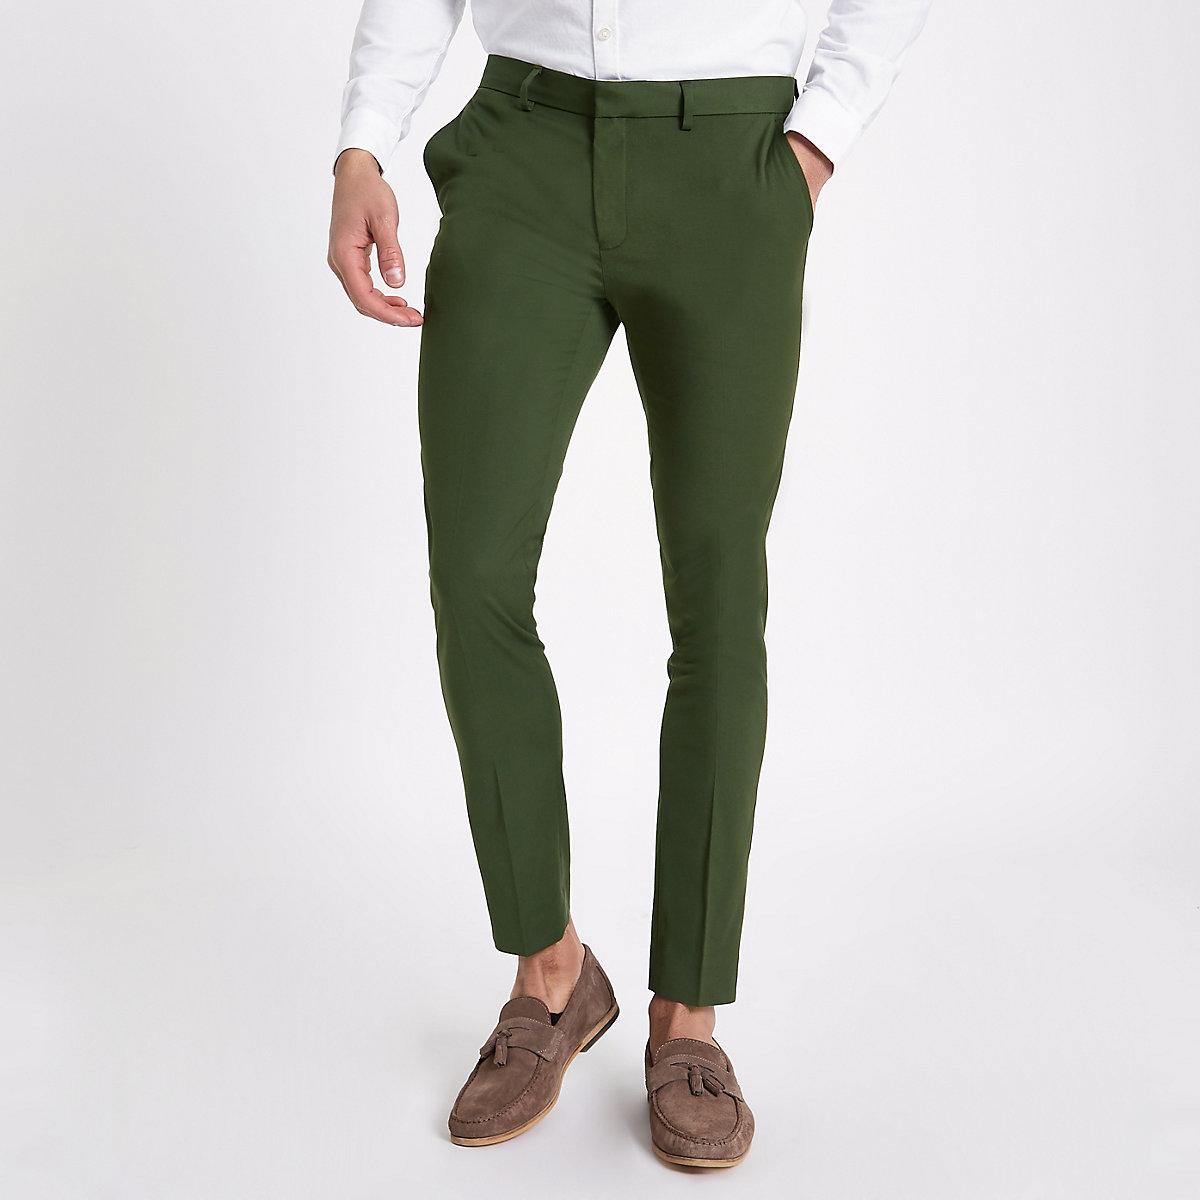 Dark green super skinny smart pants